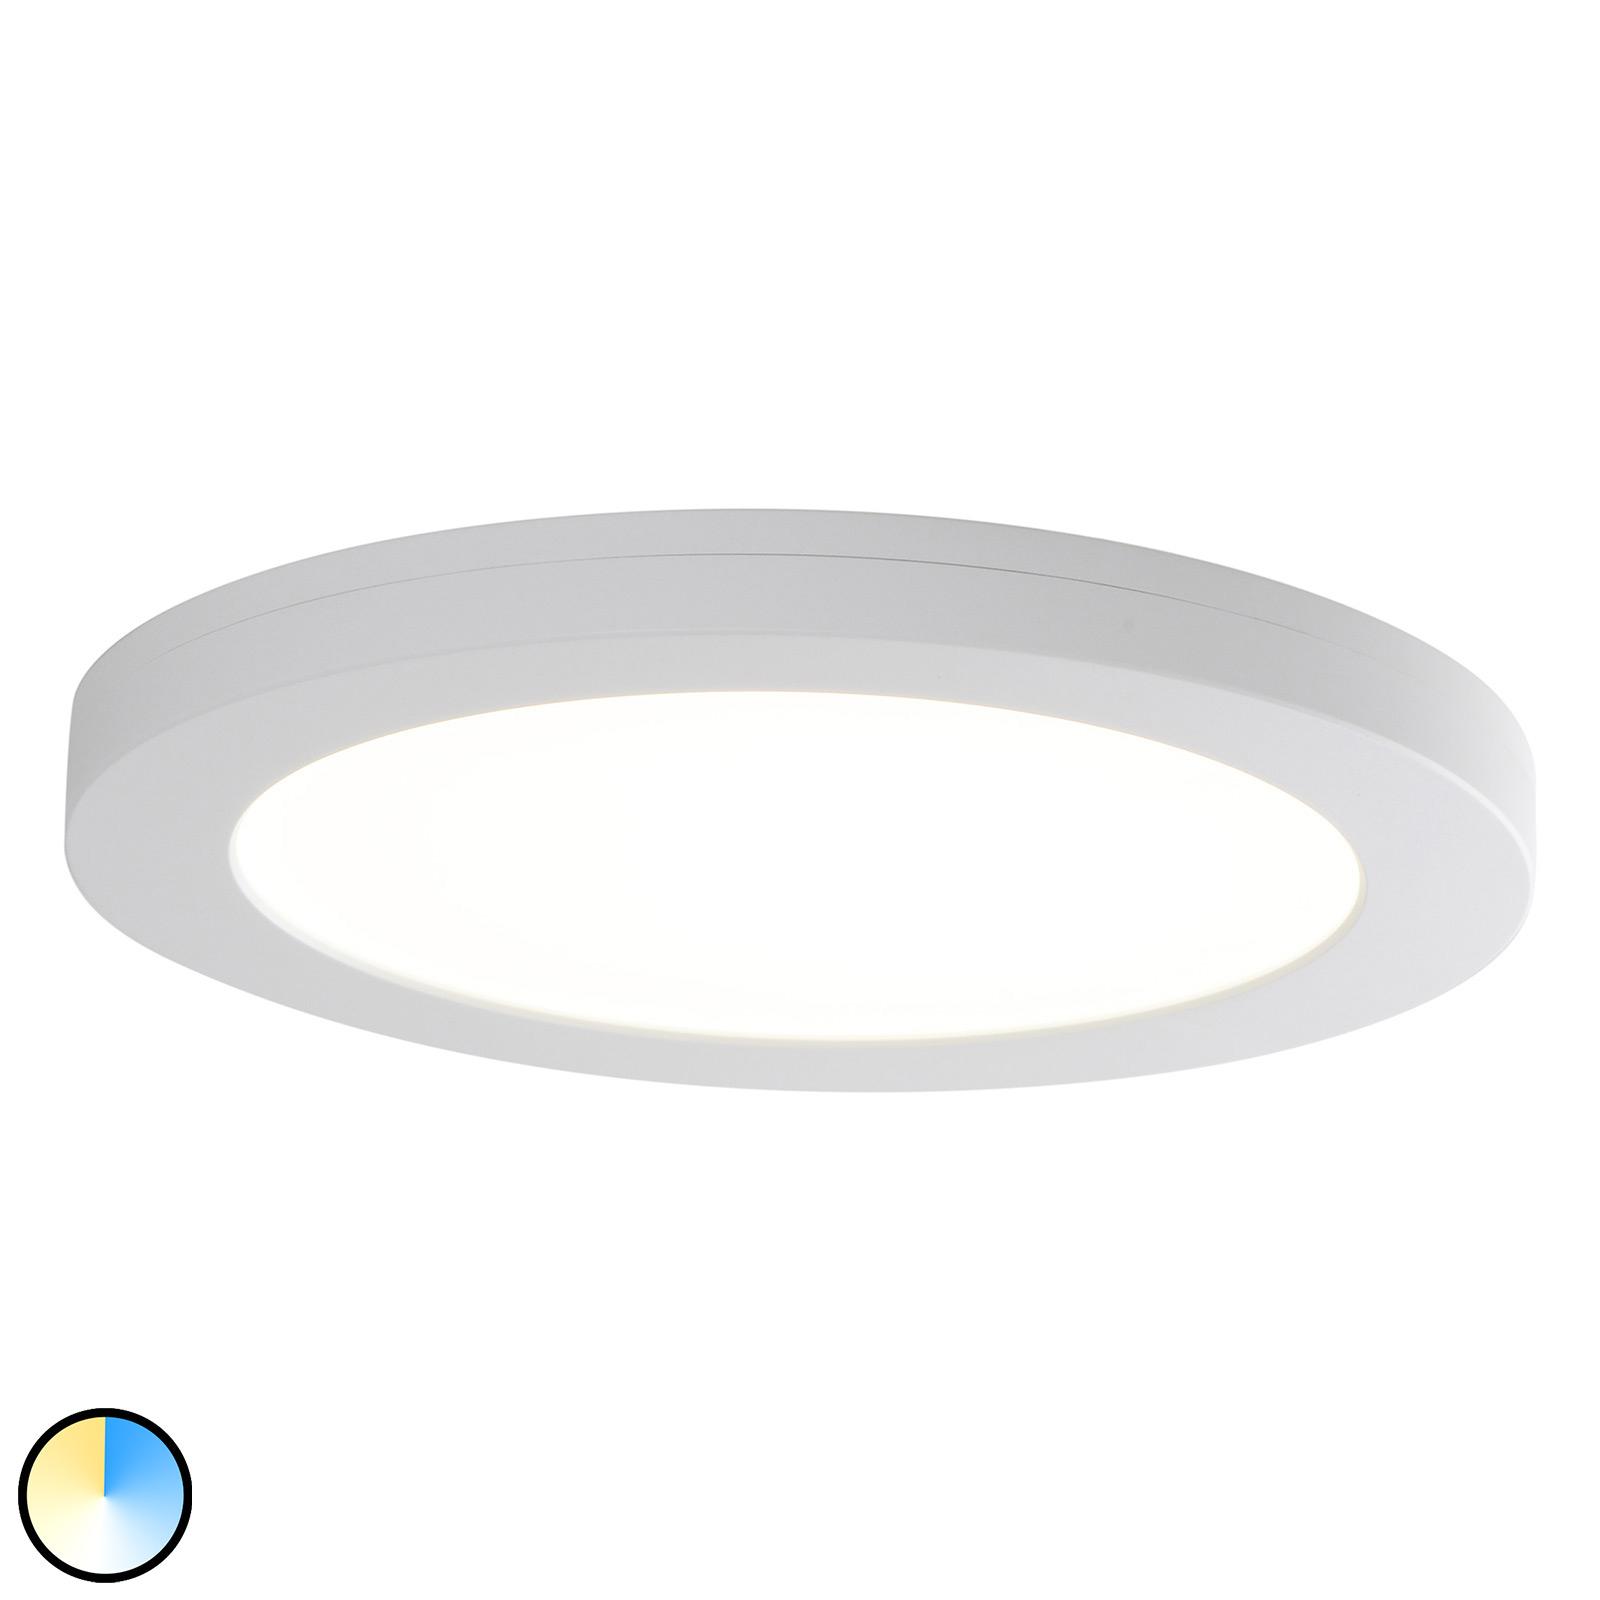 LED plafondlamp Bonus doorsnede 22,5 cm